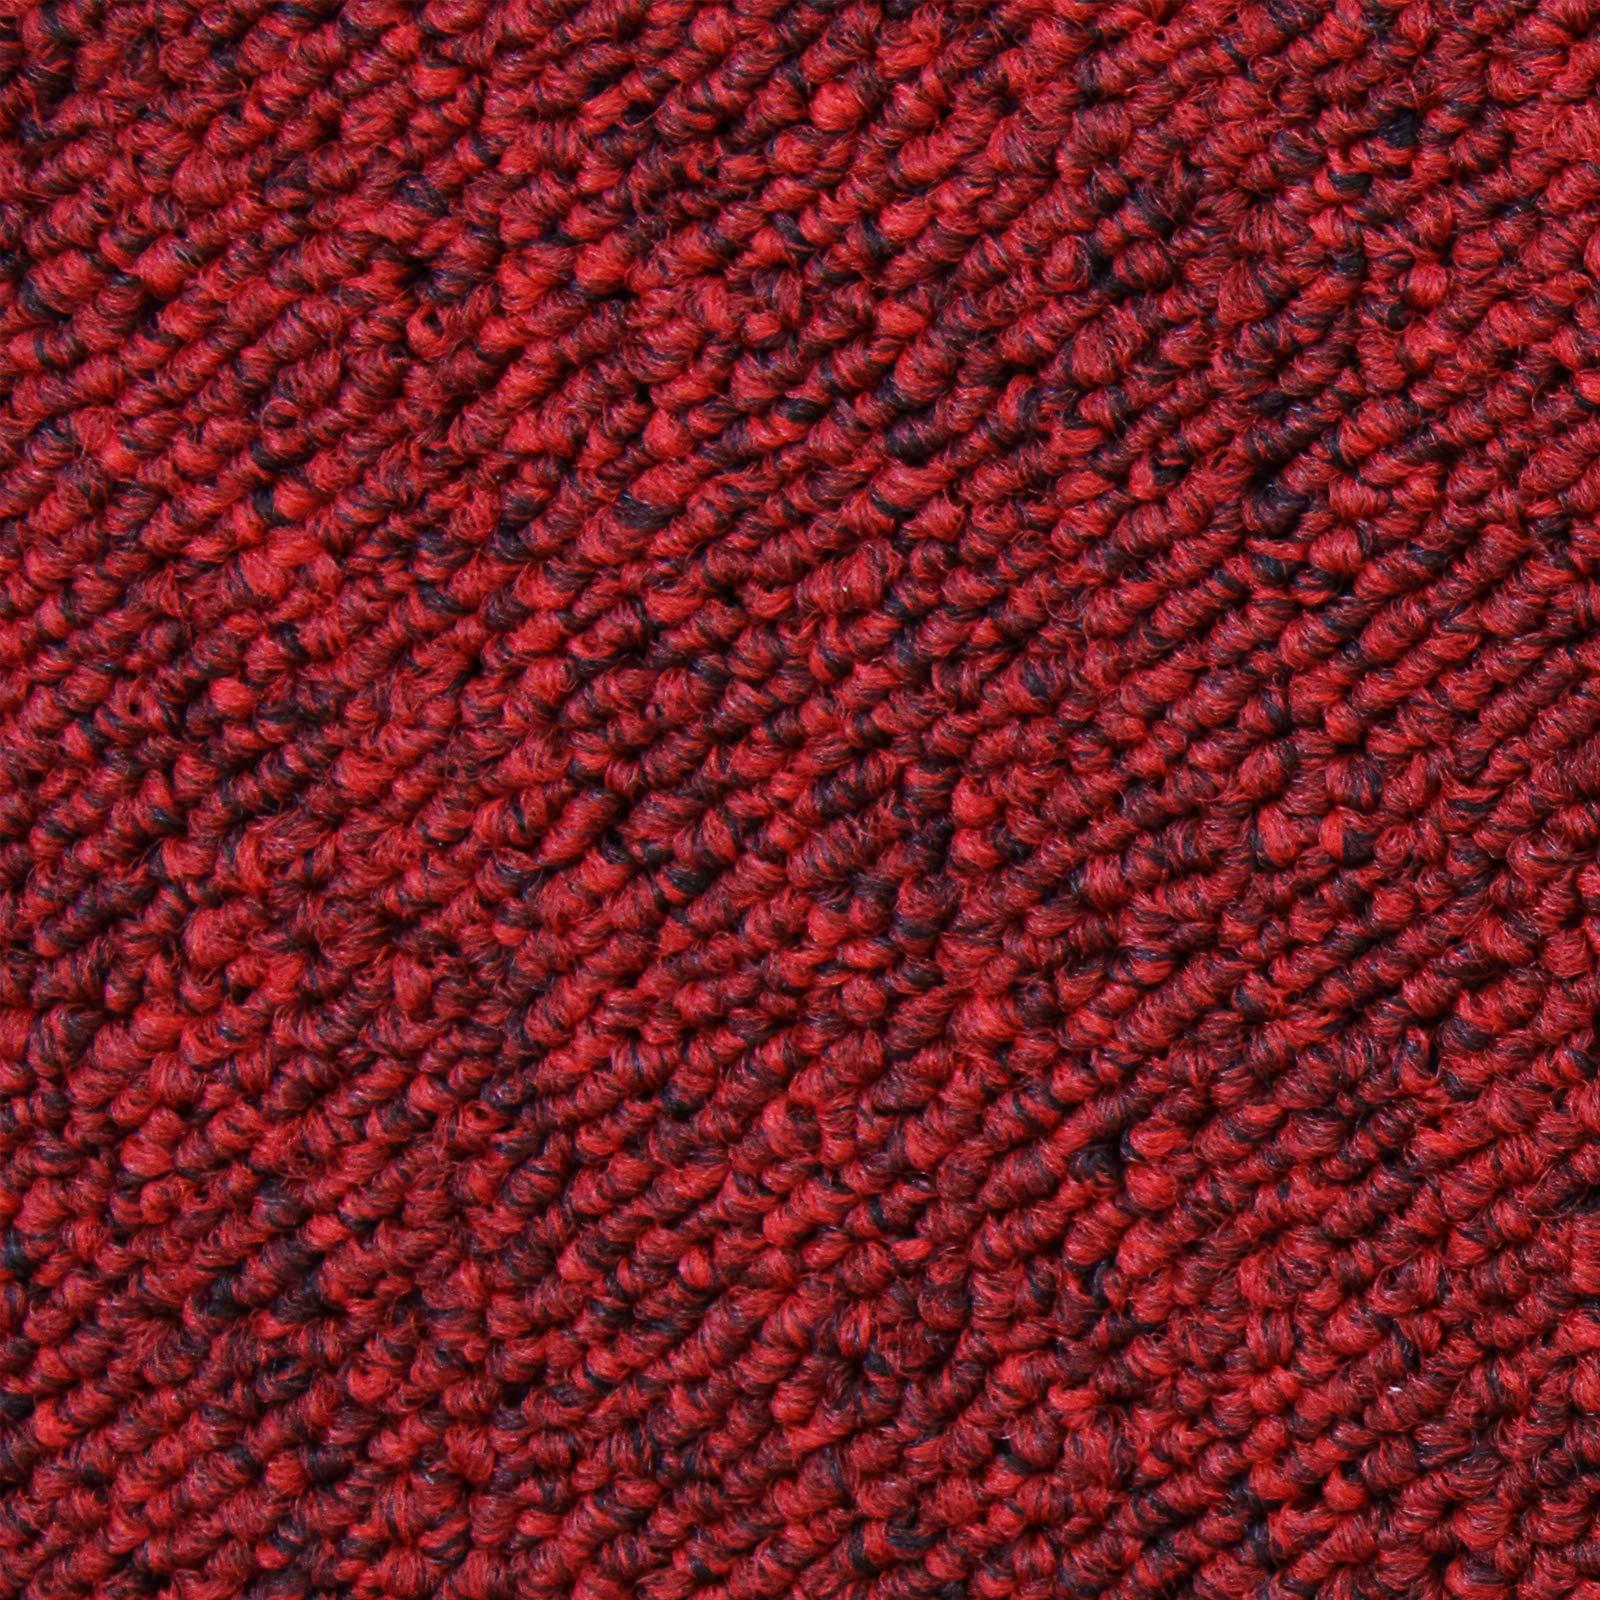 Losetas de Moqueta Pack de 20 5m2 Parches para Moqueta Hogar Oficina Color Rojo Escarlata: Amazon.es: Hogar